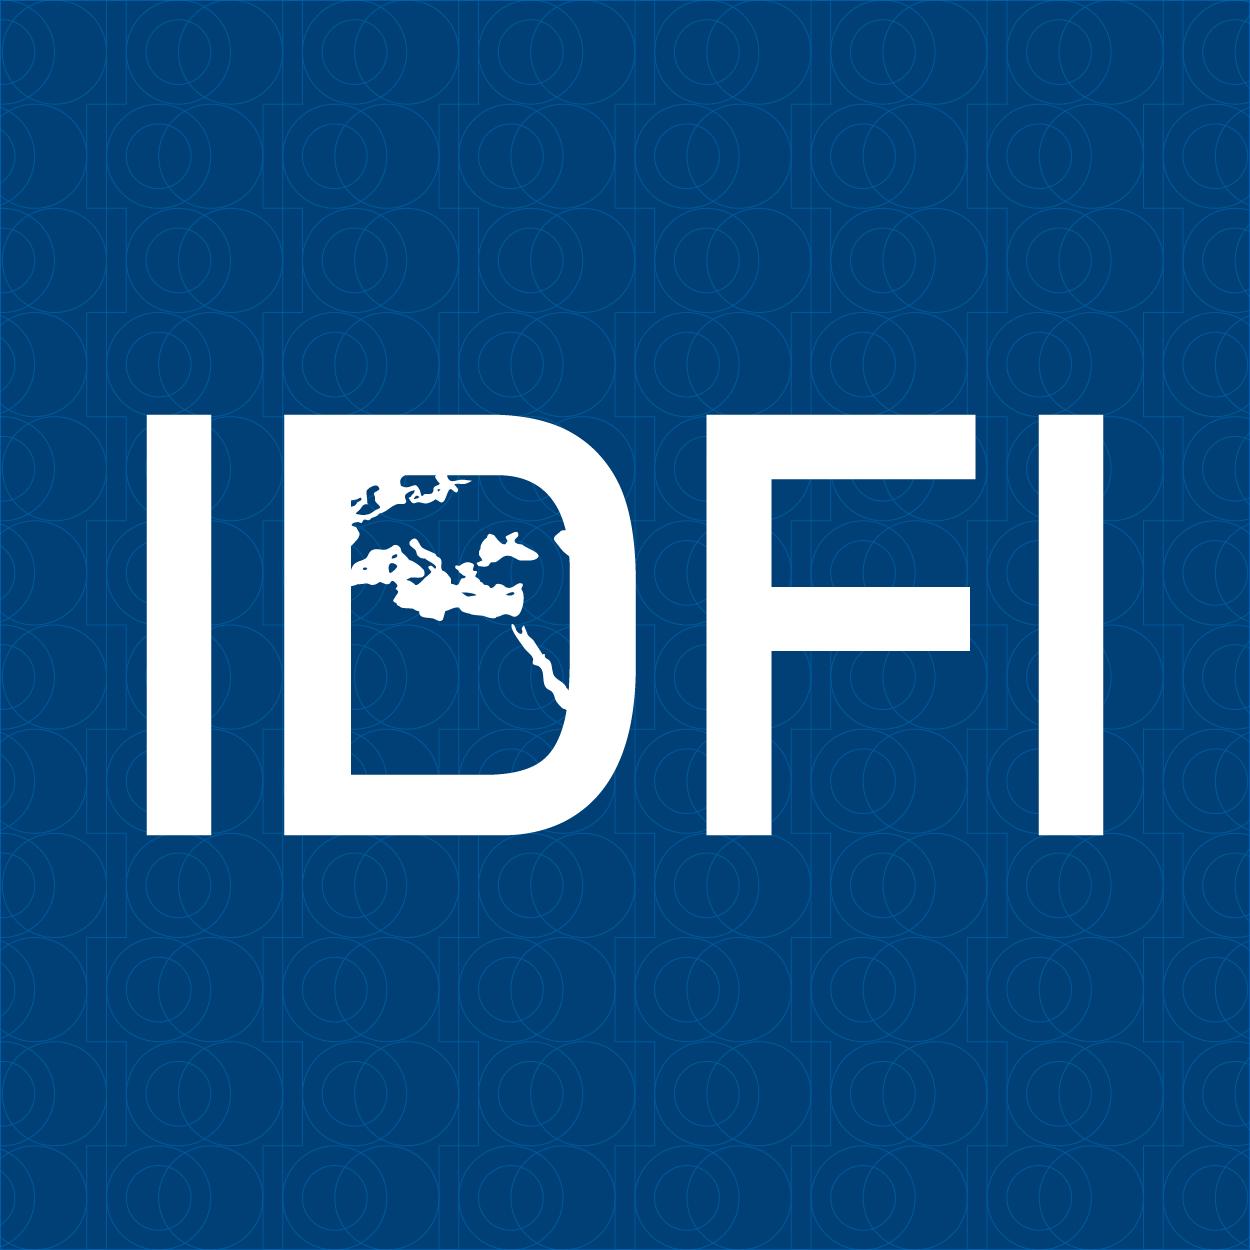 IDFI-მ და უკრაინის განმათავისუფლებელი მოძრაობის შესწავლის ცენტრმა თანამშრომლობის მემორანდუმი გააფორმეს